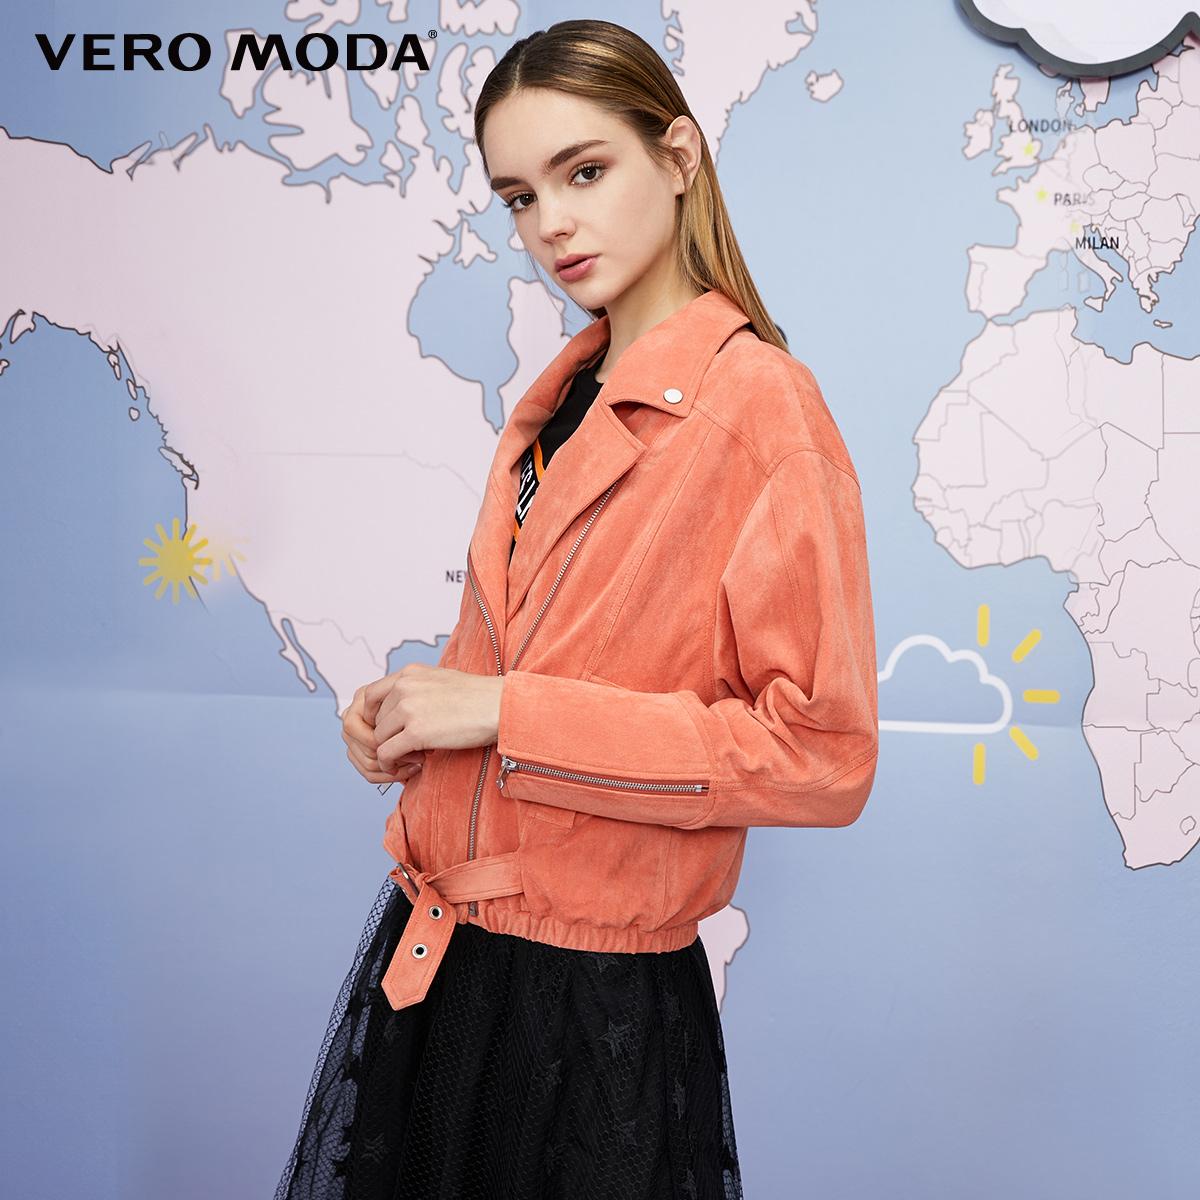 Vero Moda2019初秋新款ins小香风脏橘色夹克上衣外套女|319317514